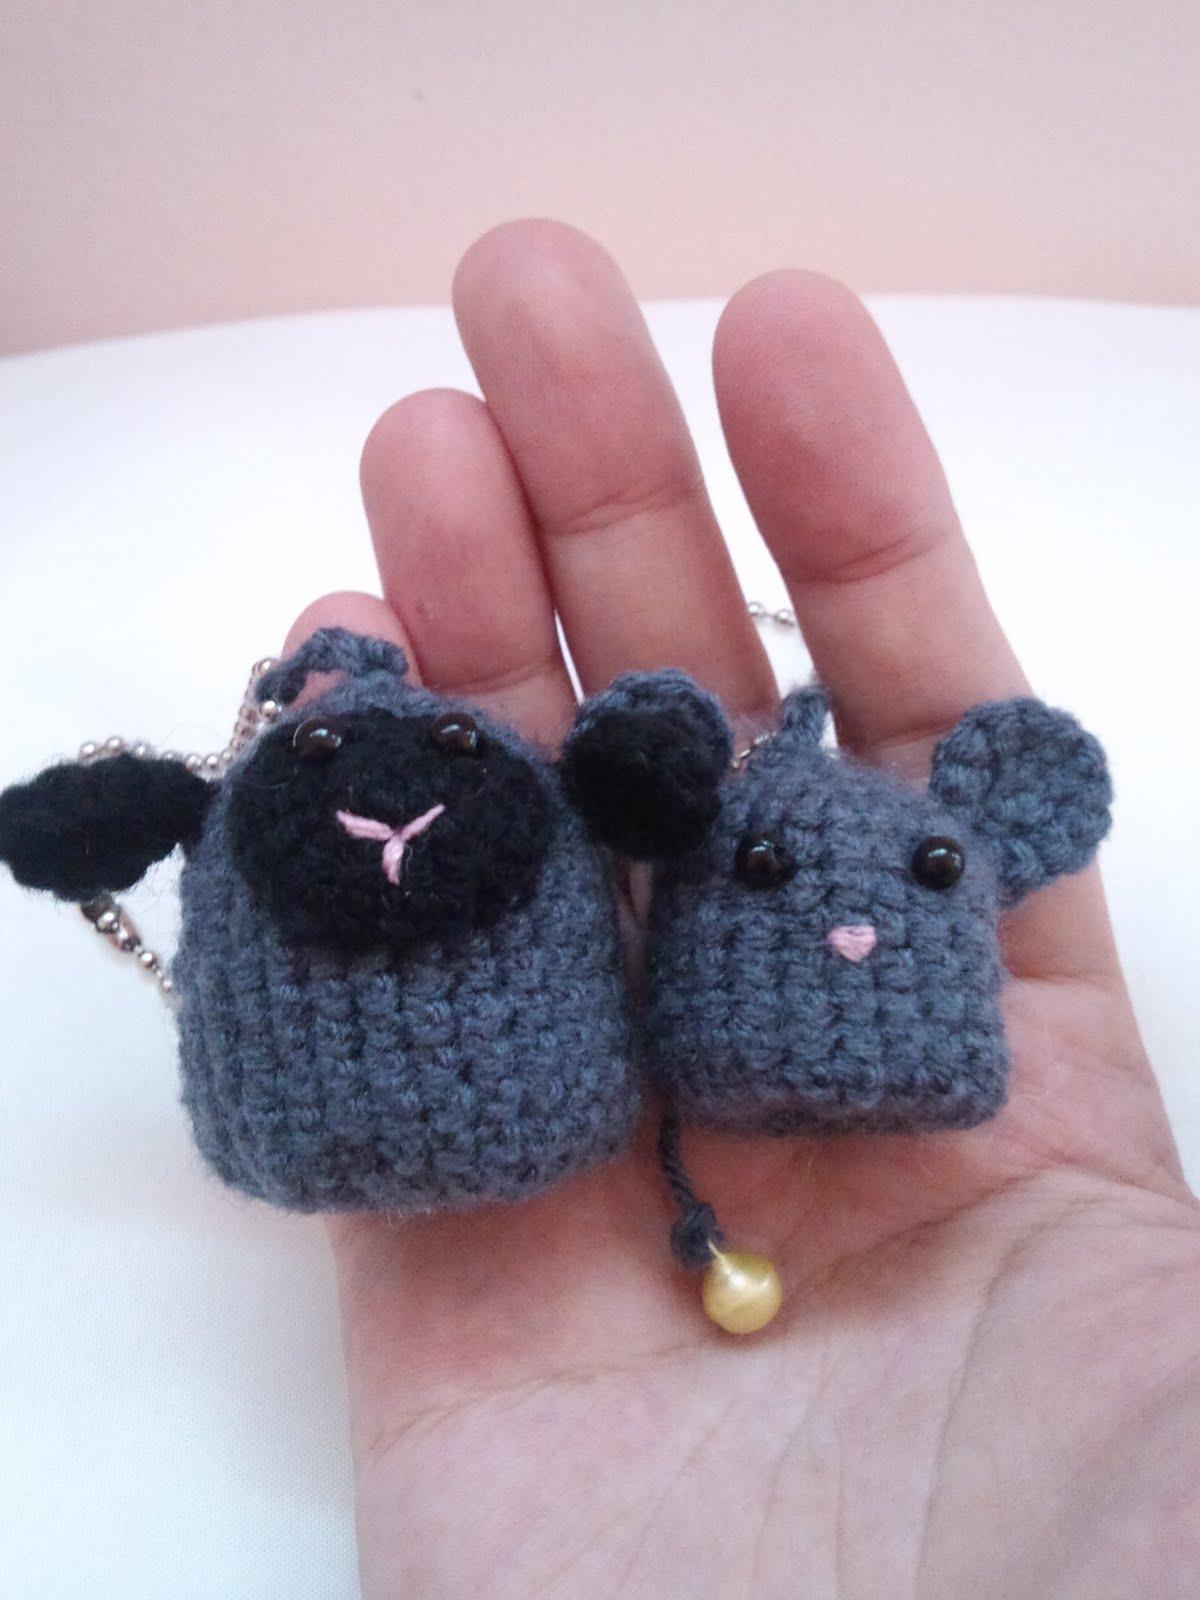 Amigurumi Koala Keychain : AhMigurumi...: My latest Obsession: Amigurumi